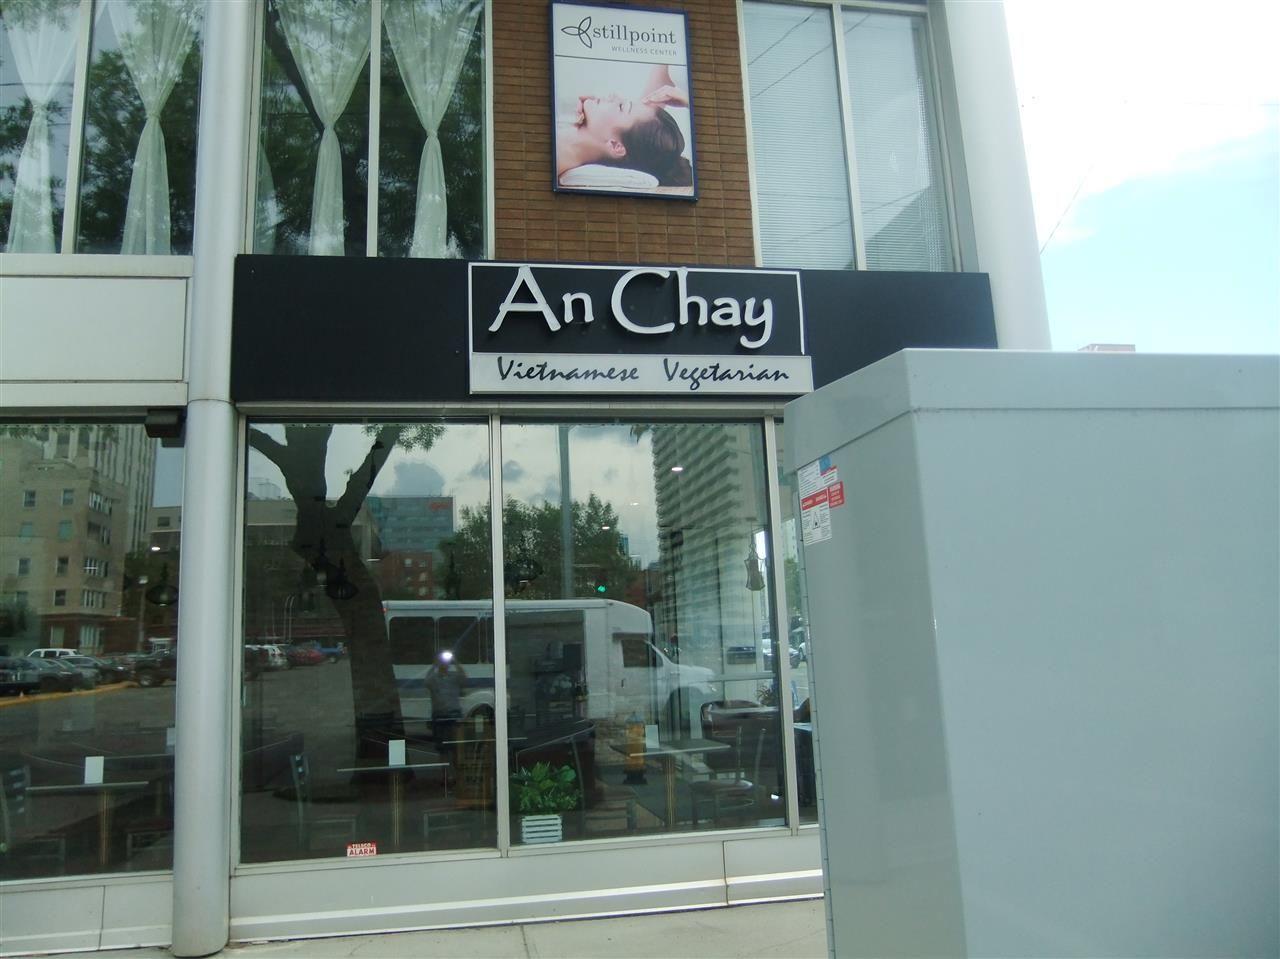 Main Photo: 11203 Jasper Avenue in Edmonton: Zone 12 Business for sale : MLS®# E4118314